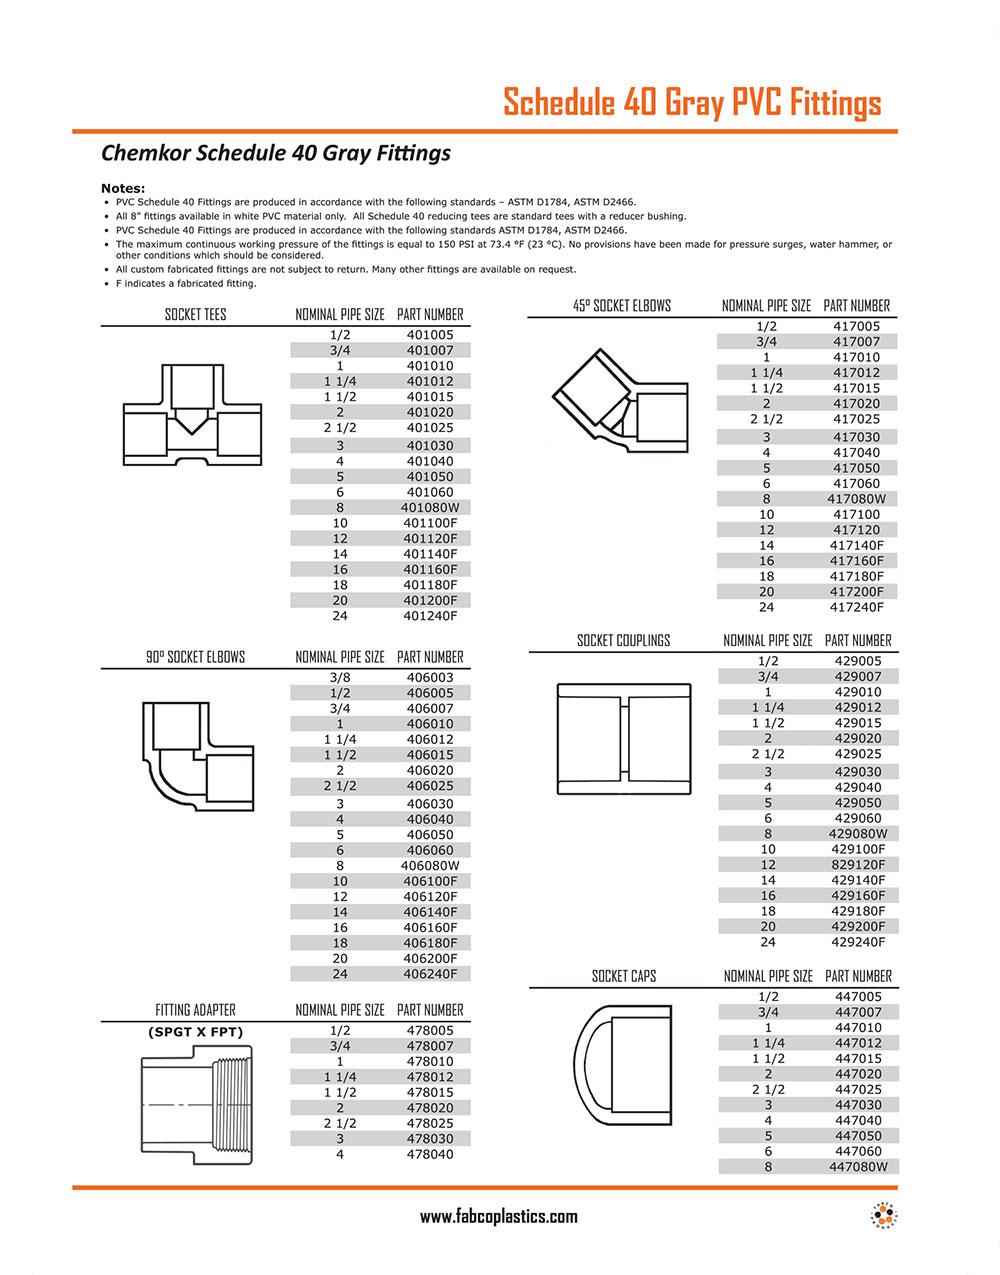 Schedule 40 Grey PVC Fittings